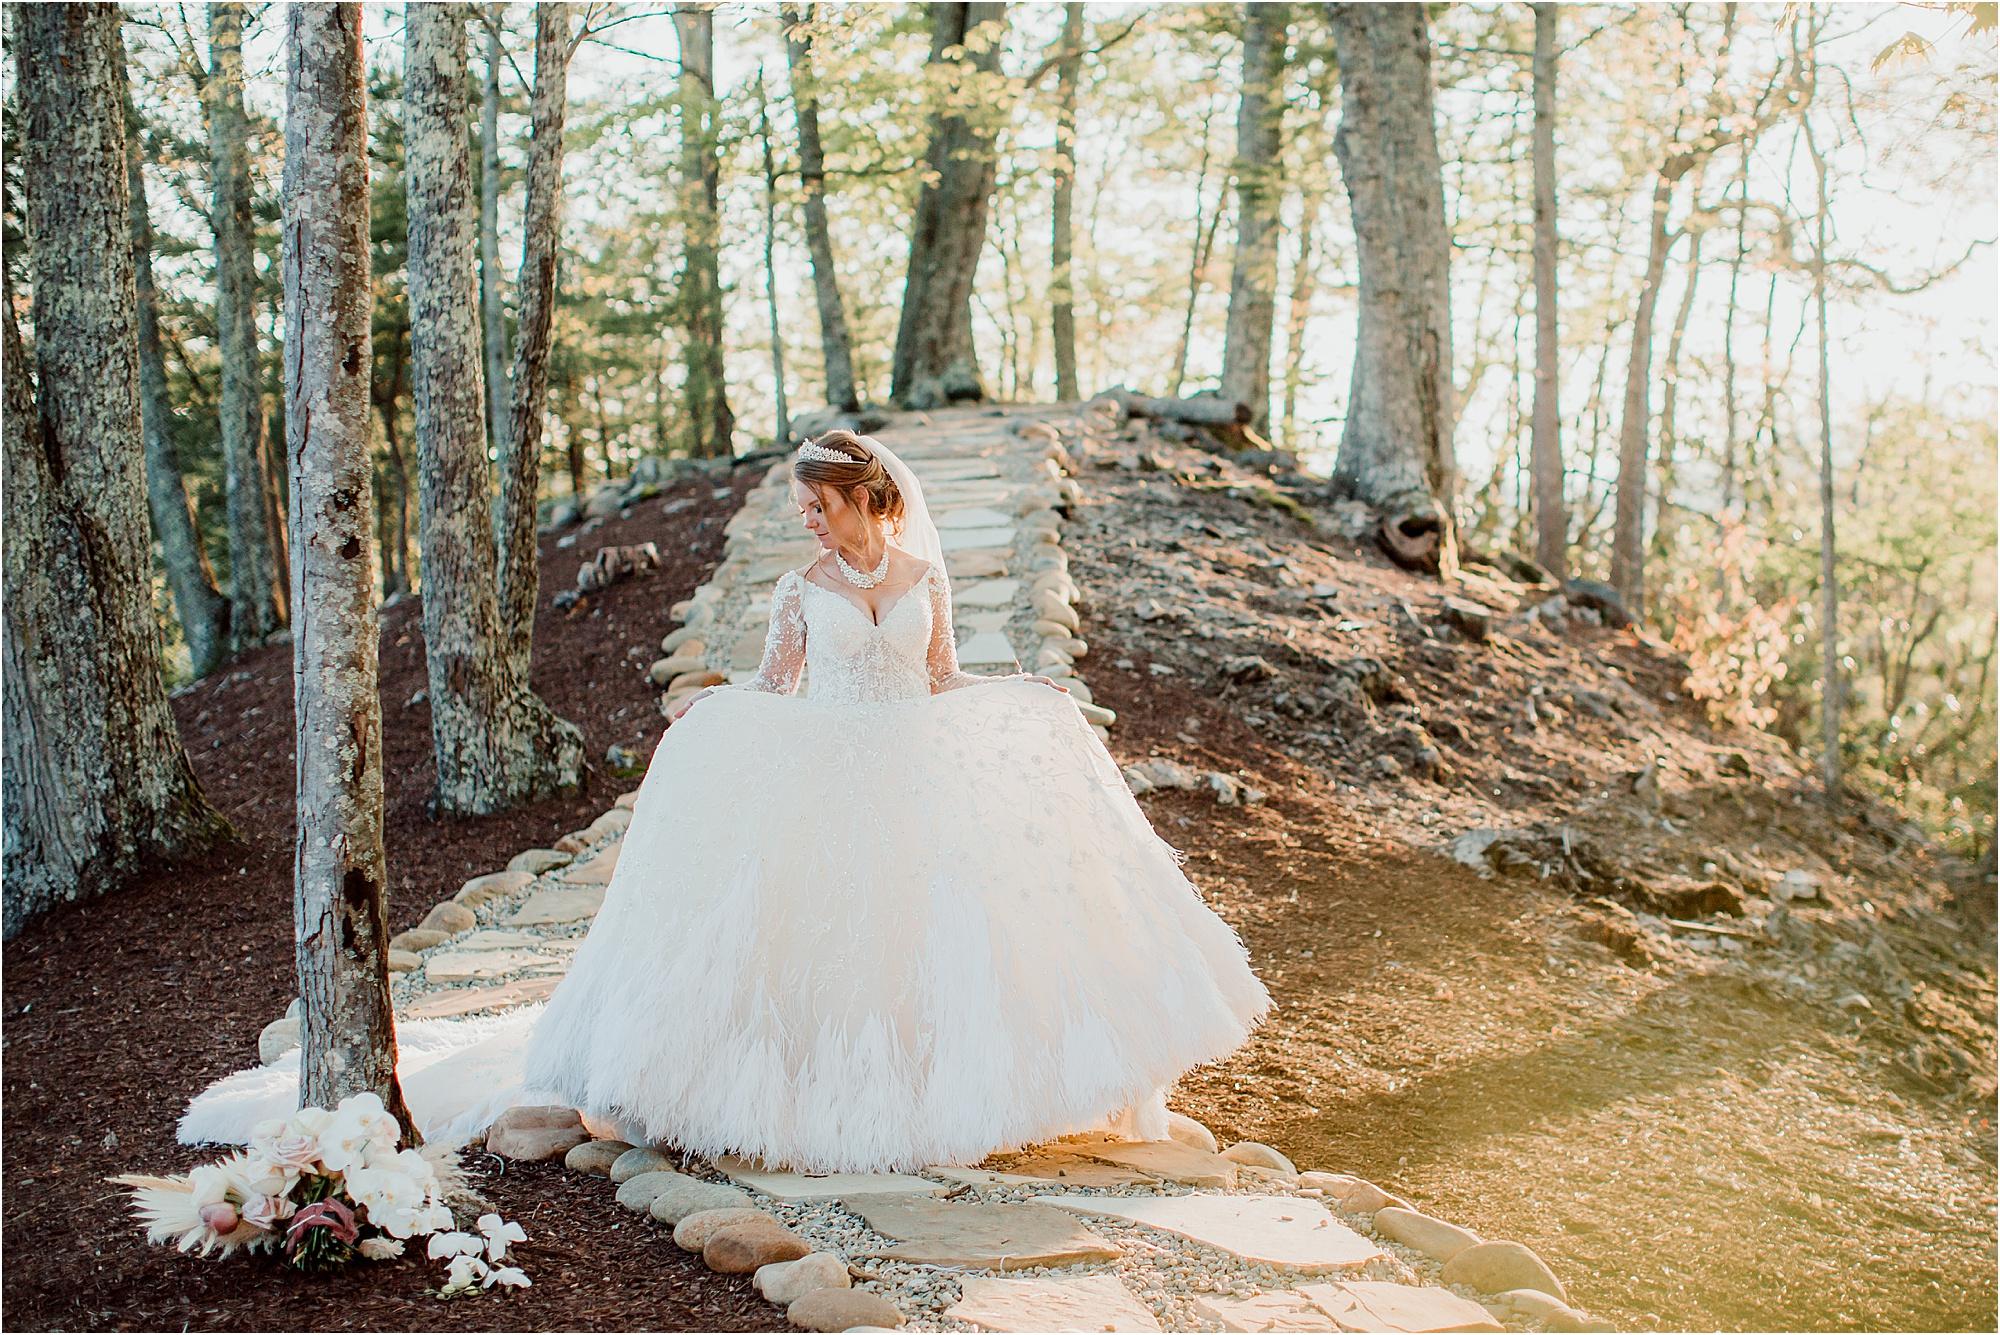 bride twirls in fairytale wedding dress